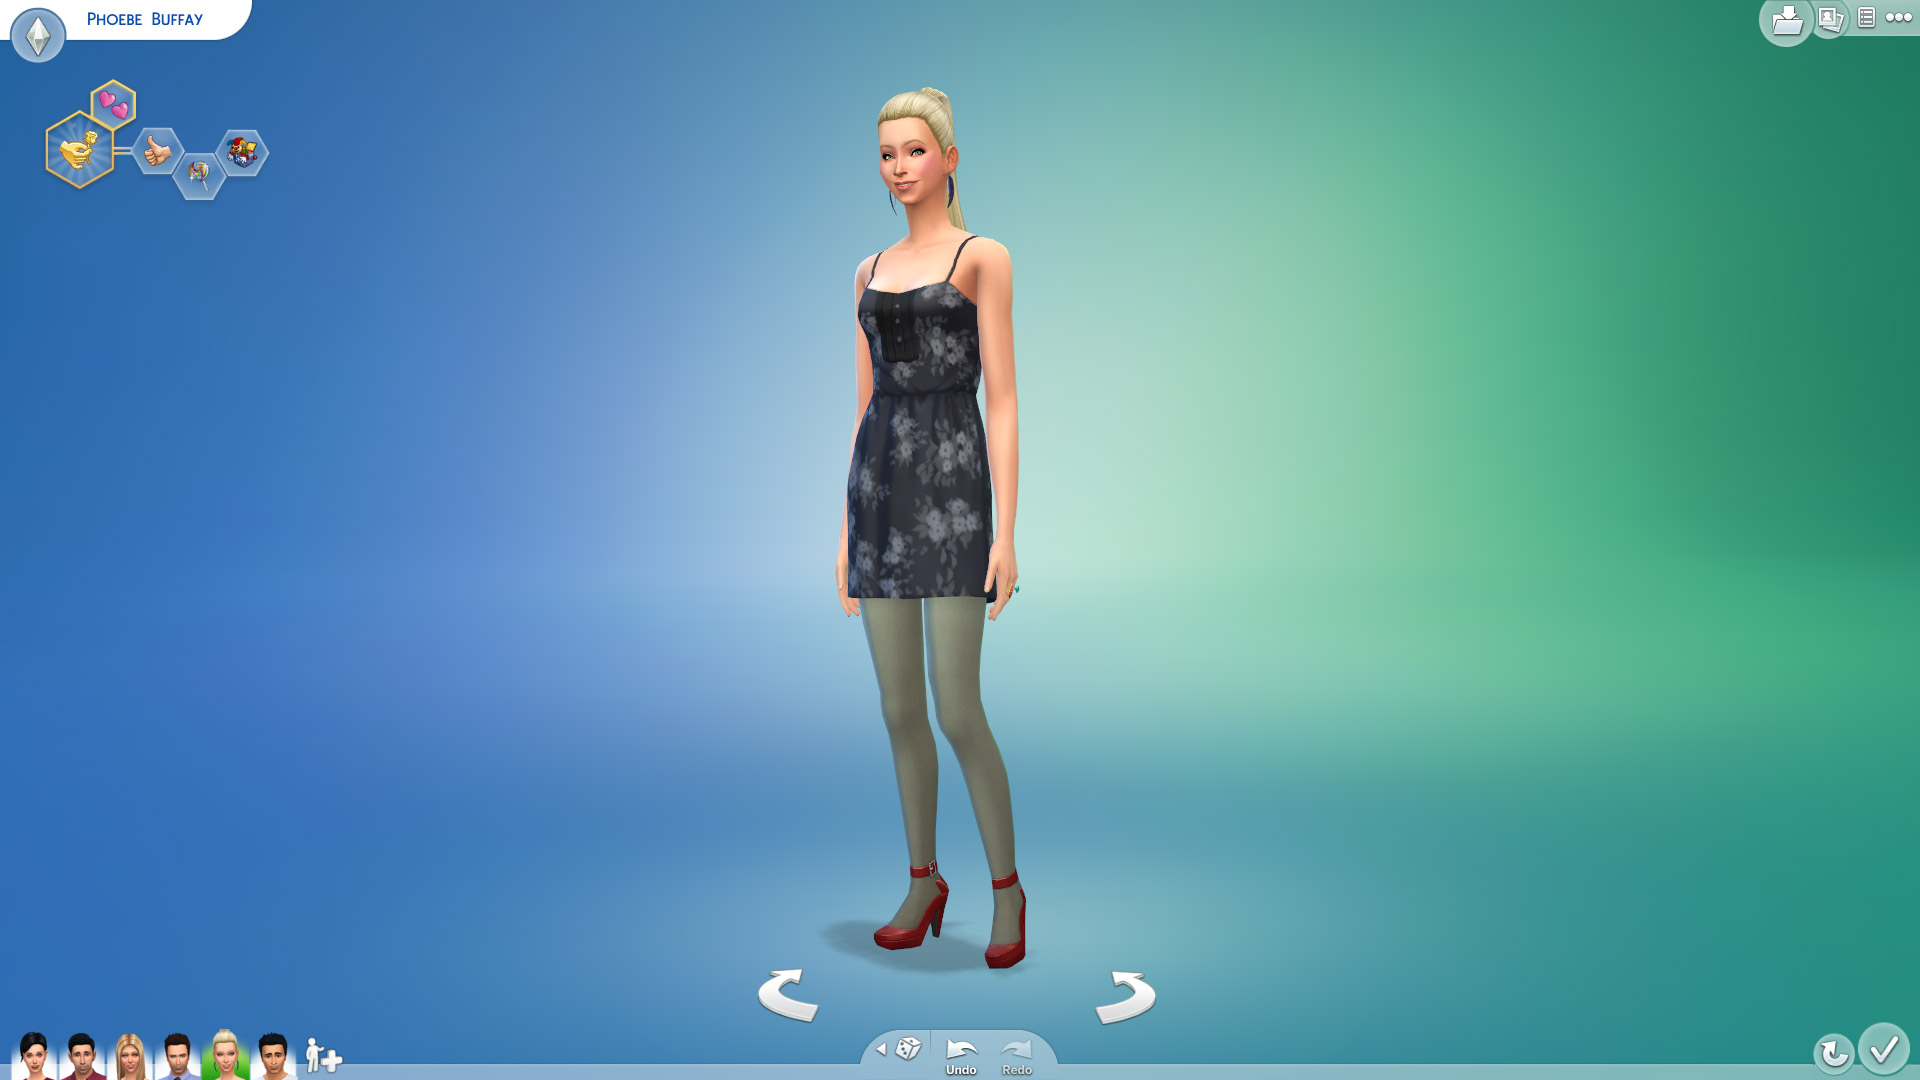 Phoebe Buffay In Sims